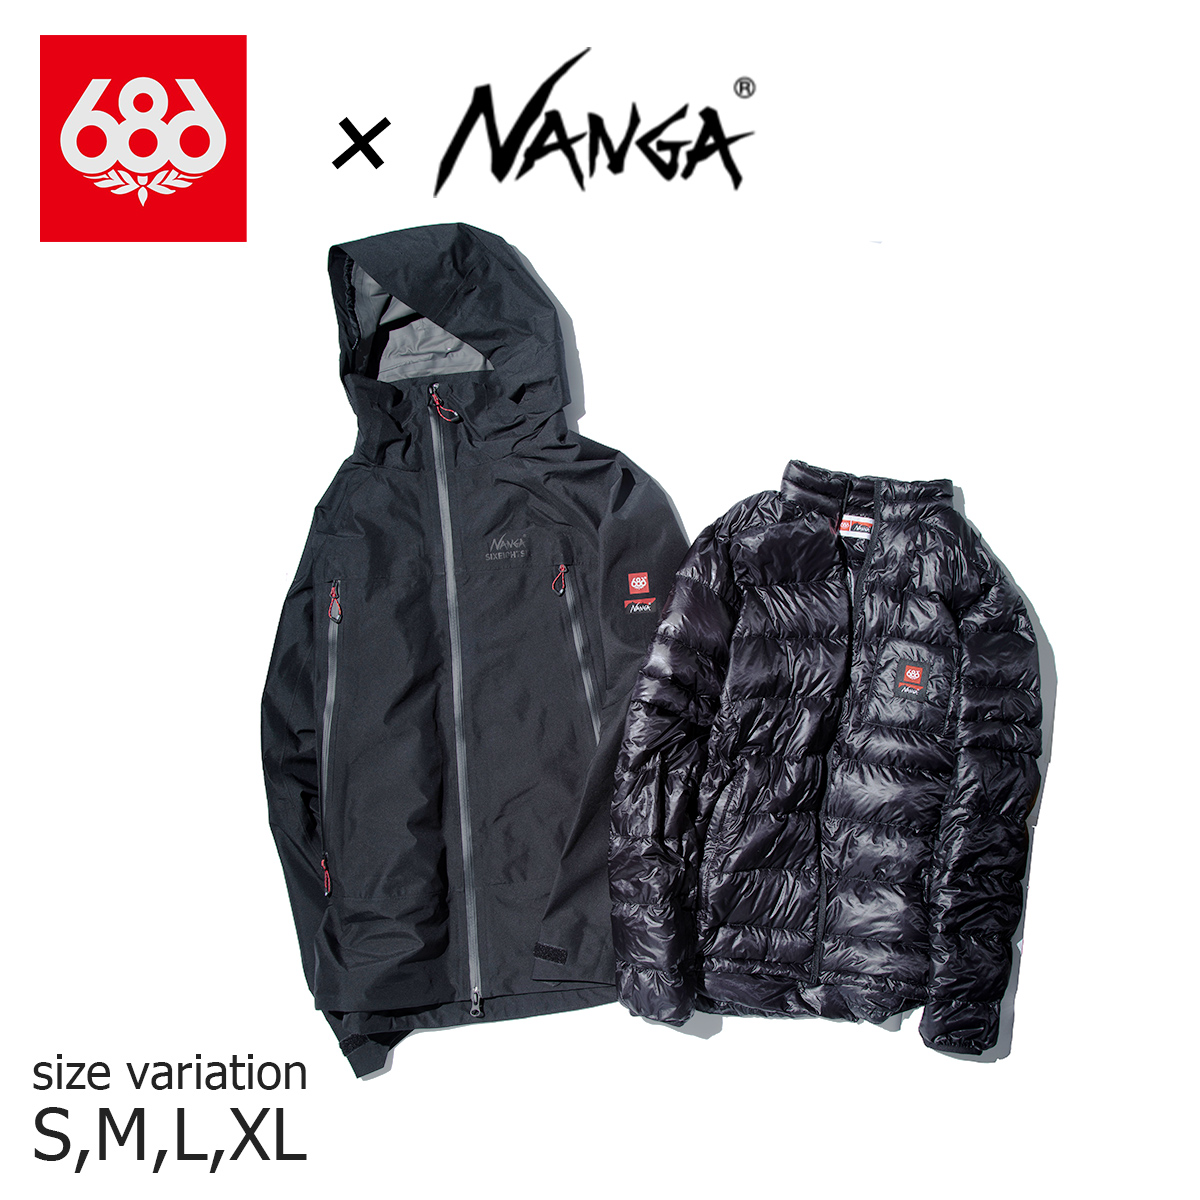 2in1で着用できる686とNANGAコラボレーションシェルジャケット 20-21 686 NANGA GRTX PACLITE SMARTY JACKET BLACK スノーボード ナンガ スノボー 期間限定特価品 スノーウェア ロクハチロク ジャケット wear シックスエイトシックス 安値